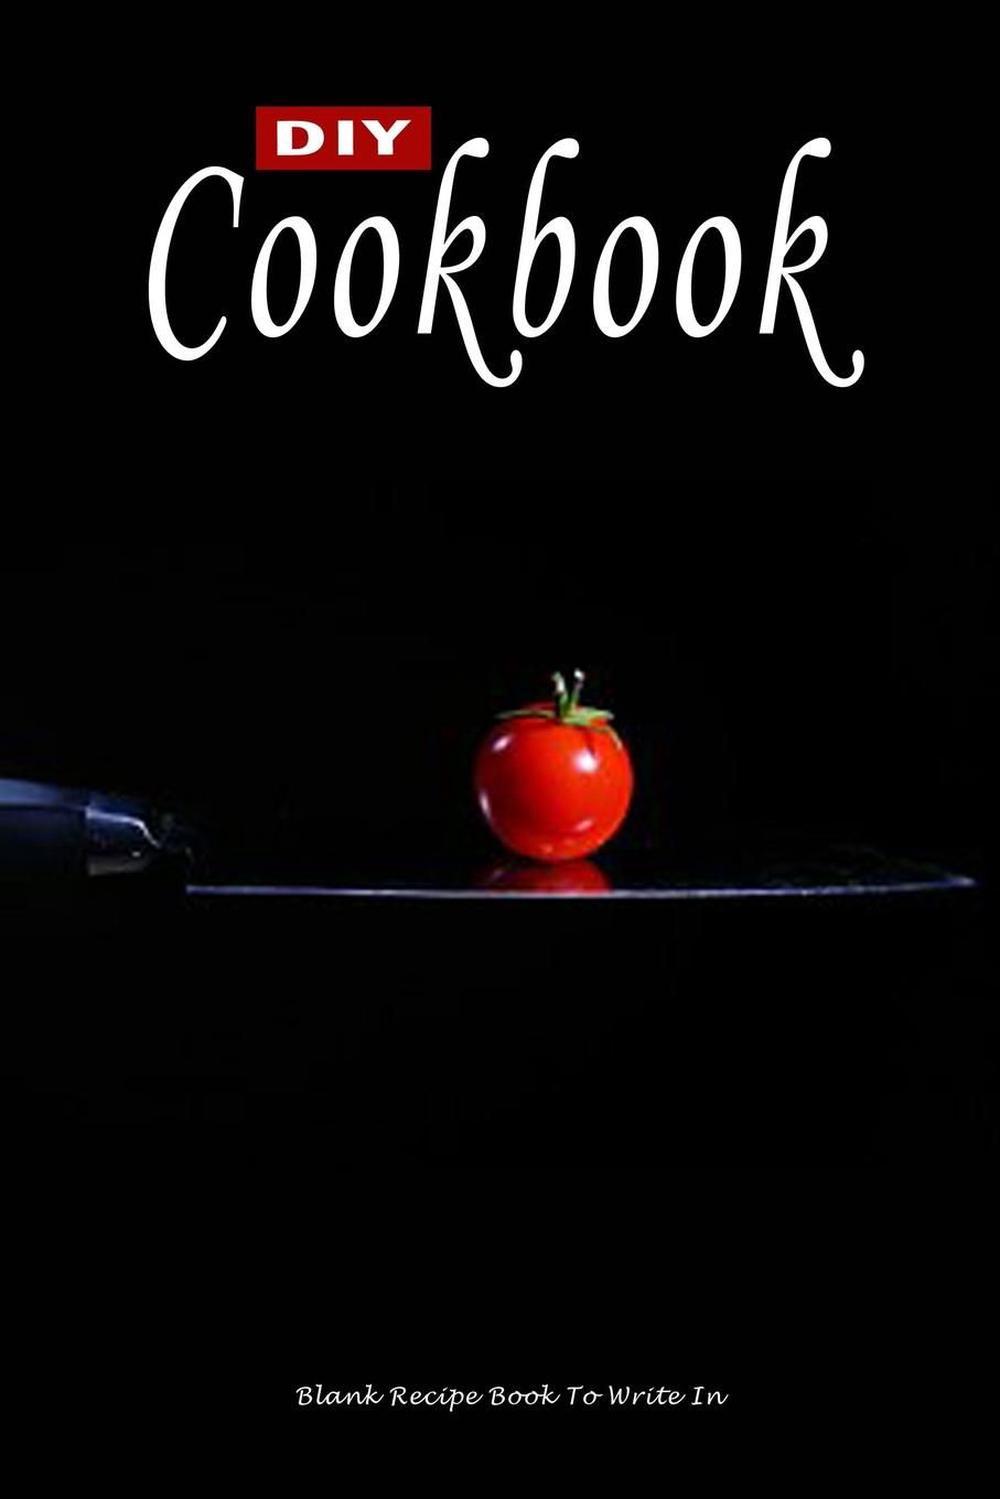 diy cookbook blank recipe book to write in make your own recipe